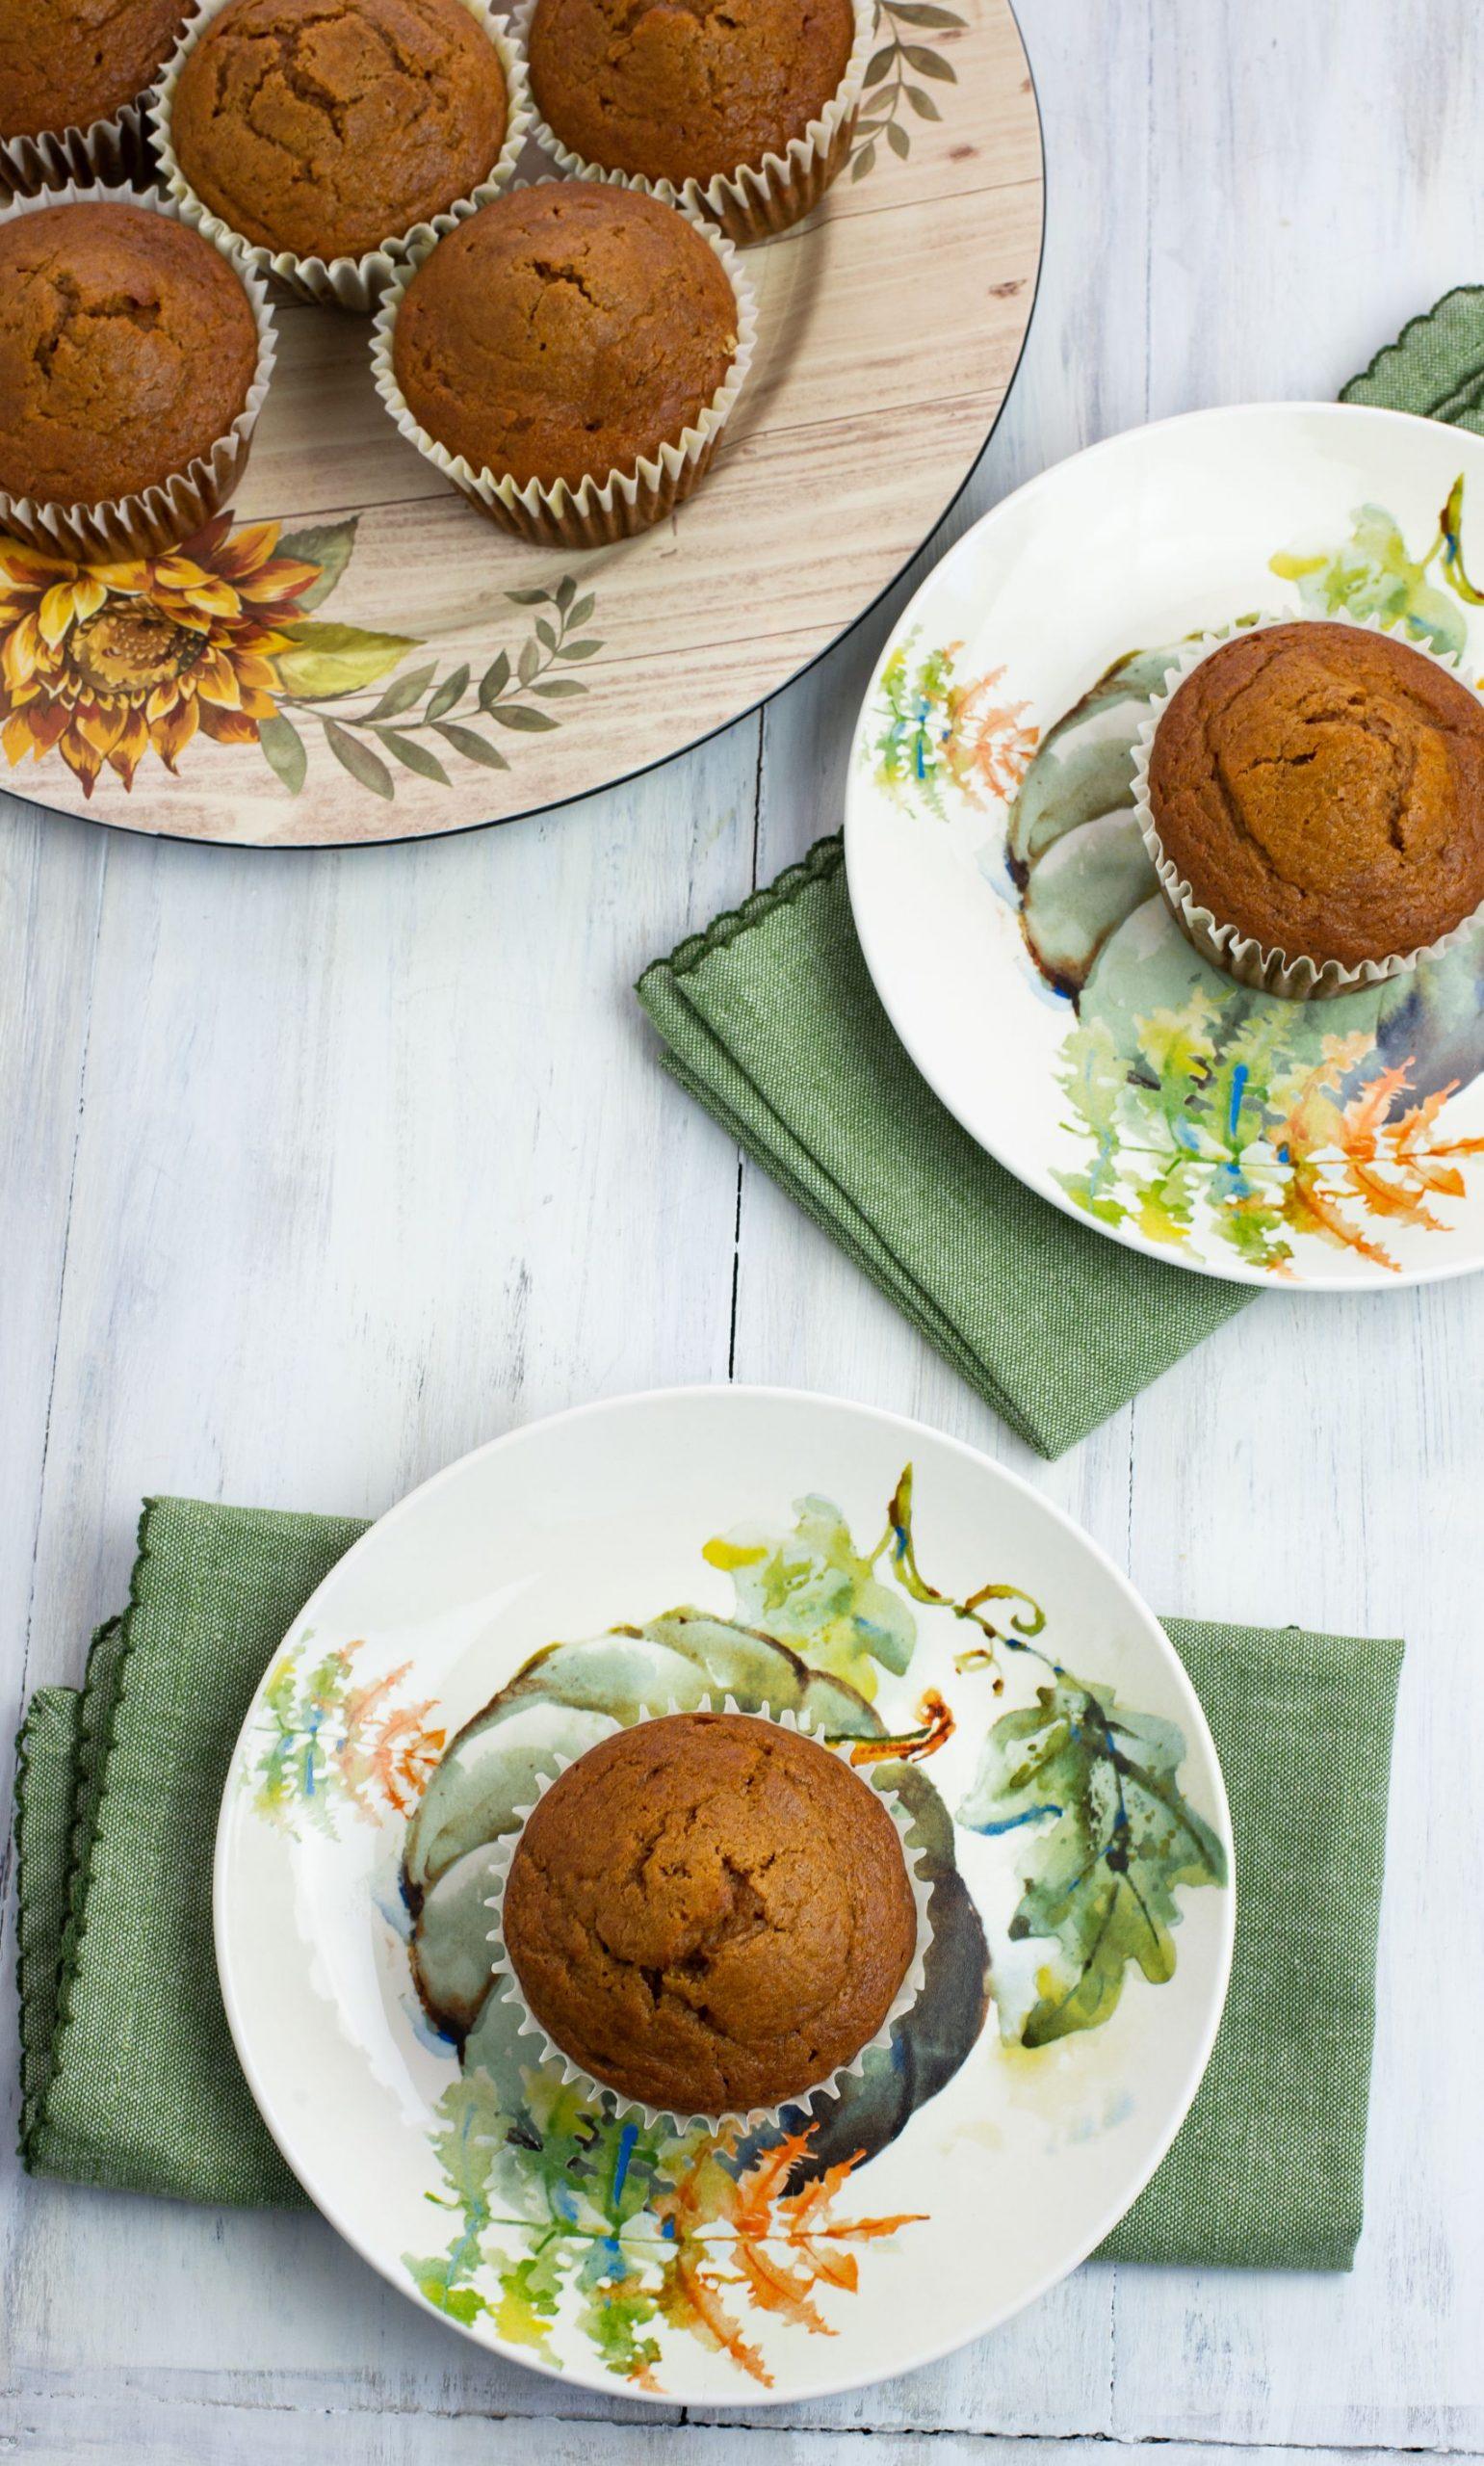 Pumpkin Spice Peanut Butter Muffins